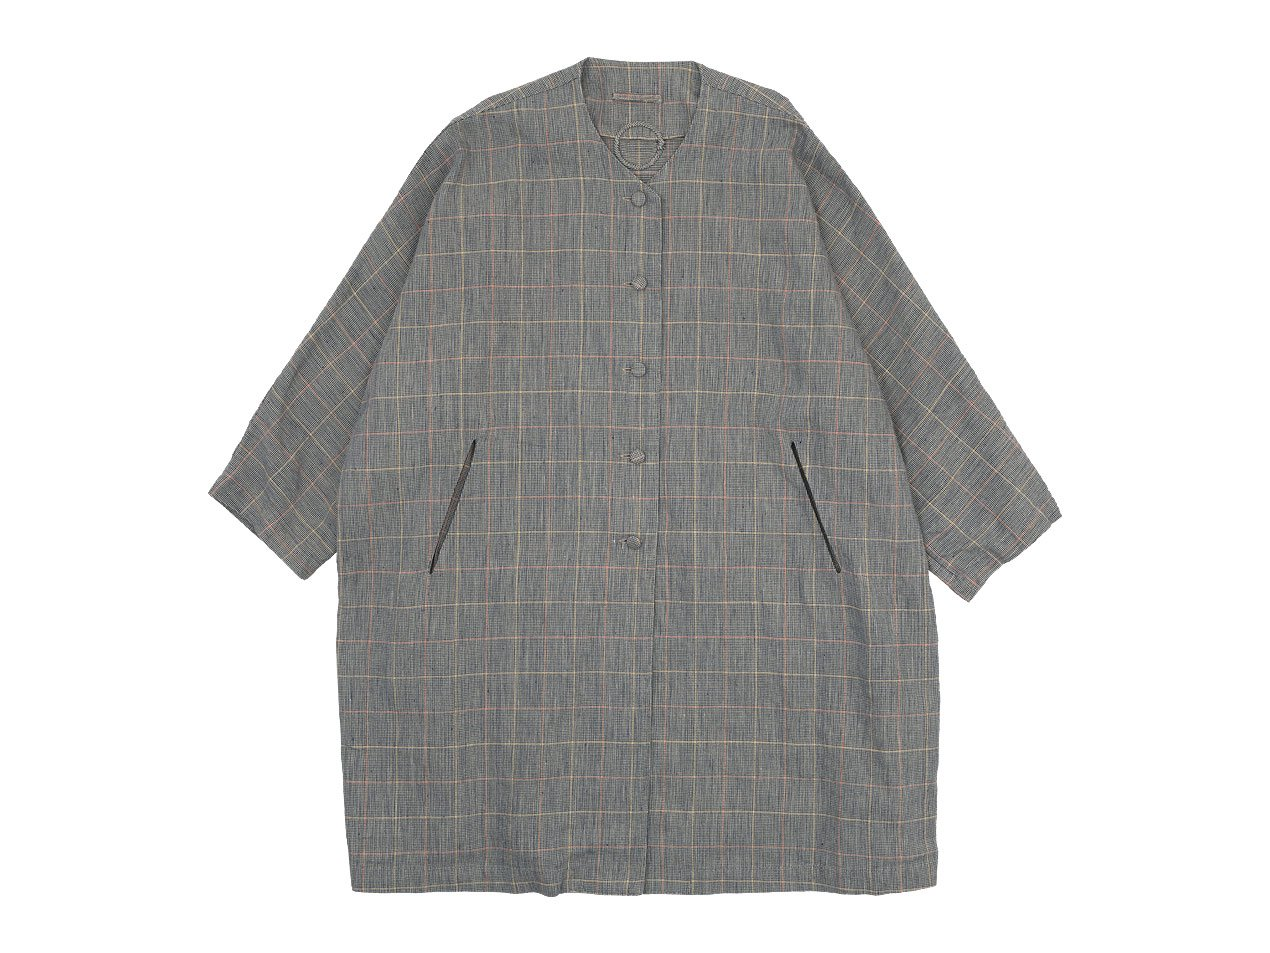 Atelier d'antan Verlaine(ヴェルレーヌ) Oversaized Coat Cotton Linen NAVY CHECK